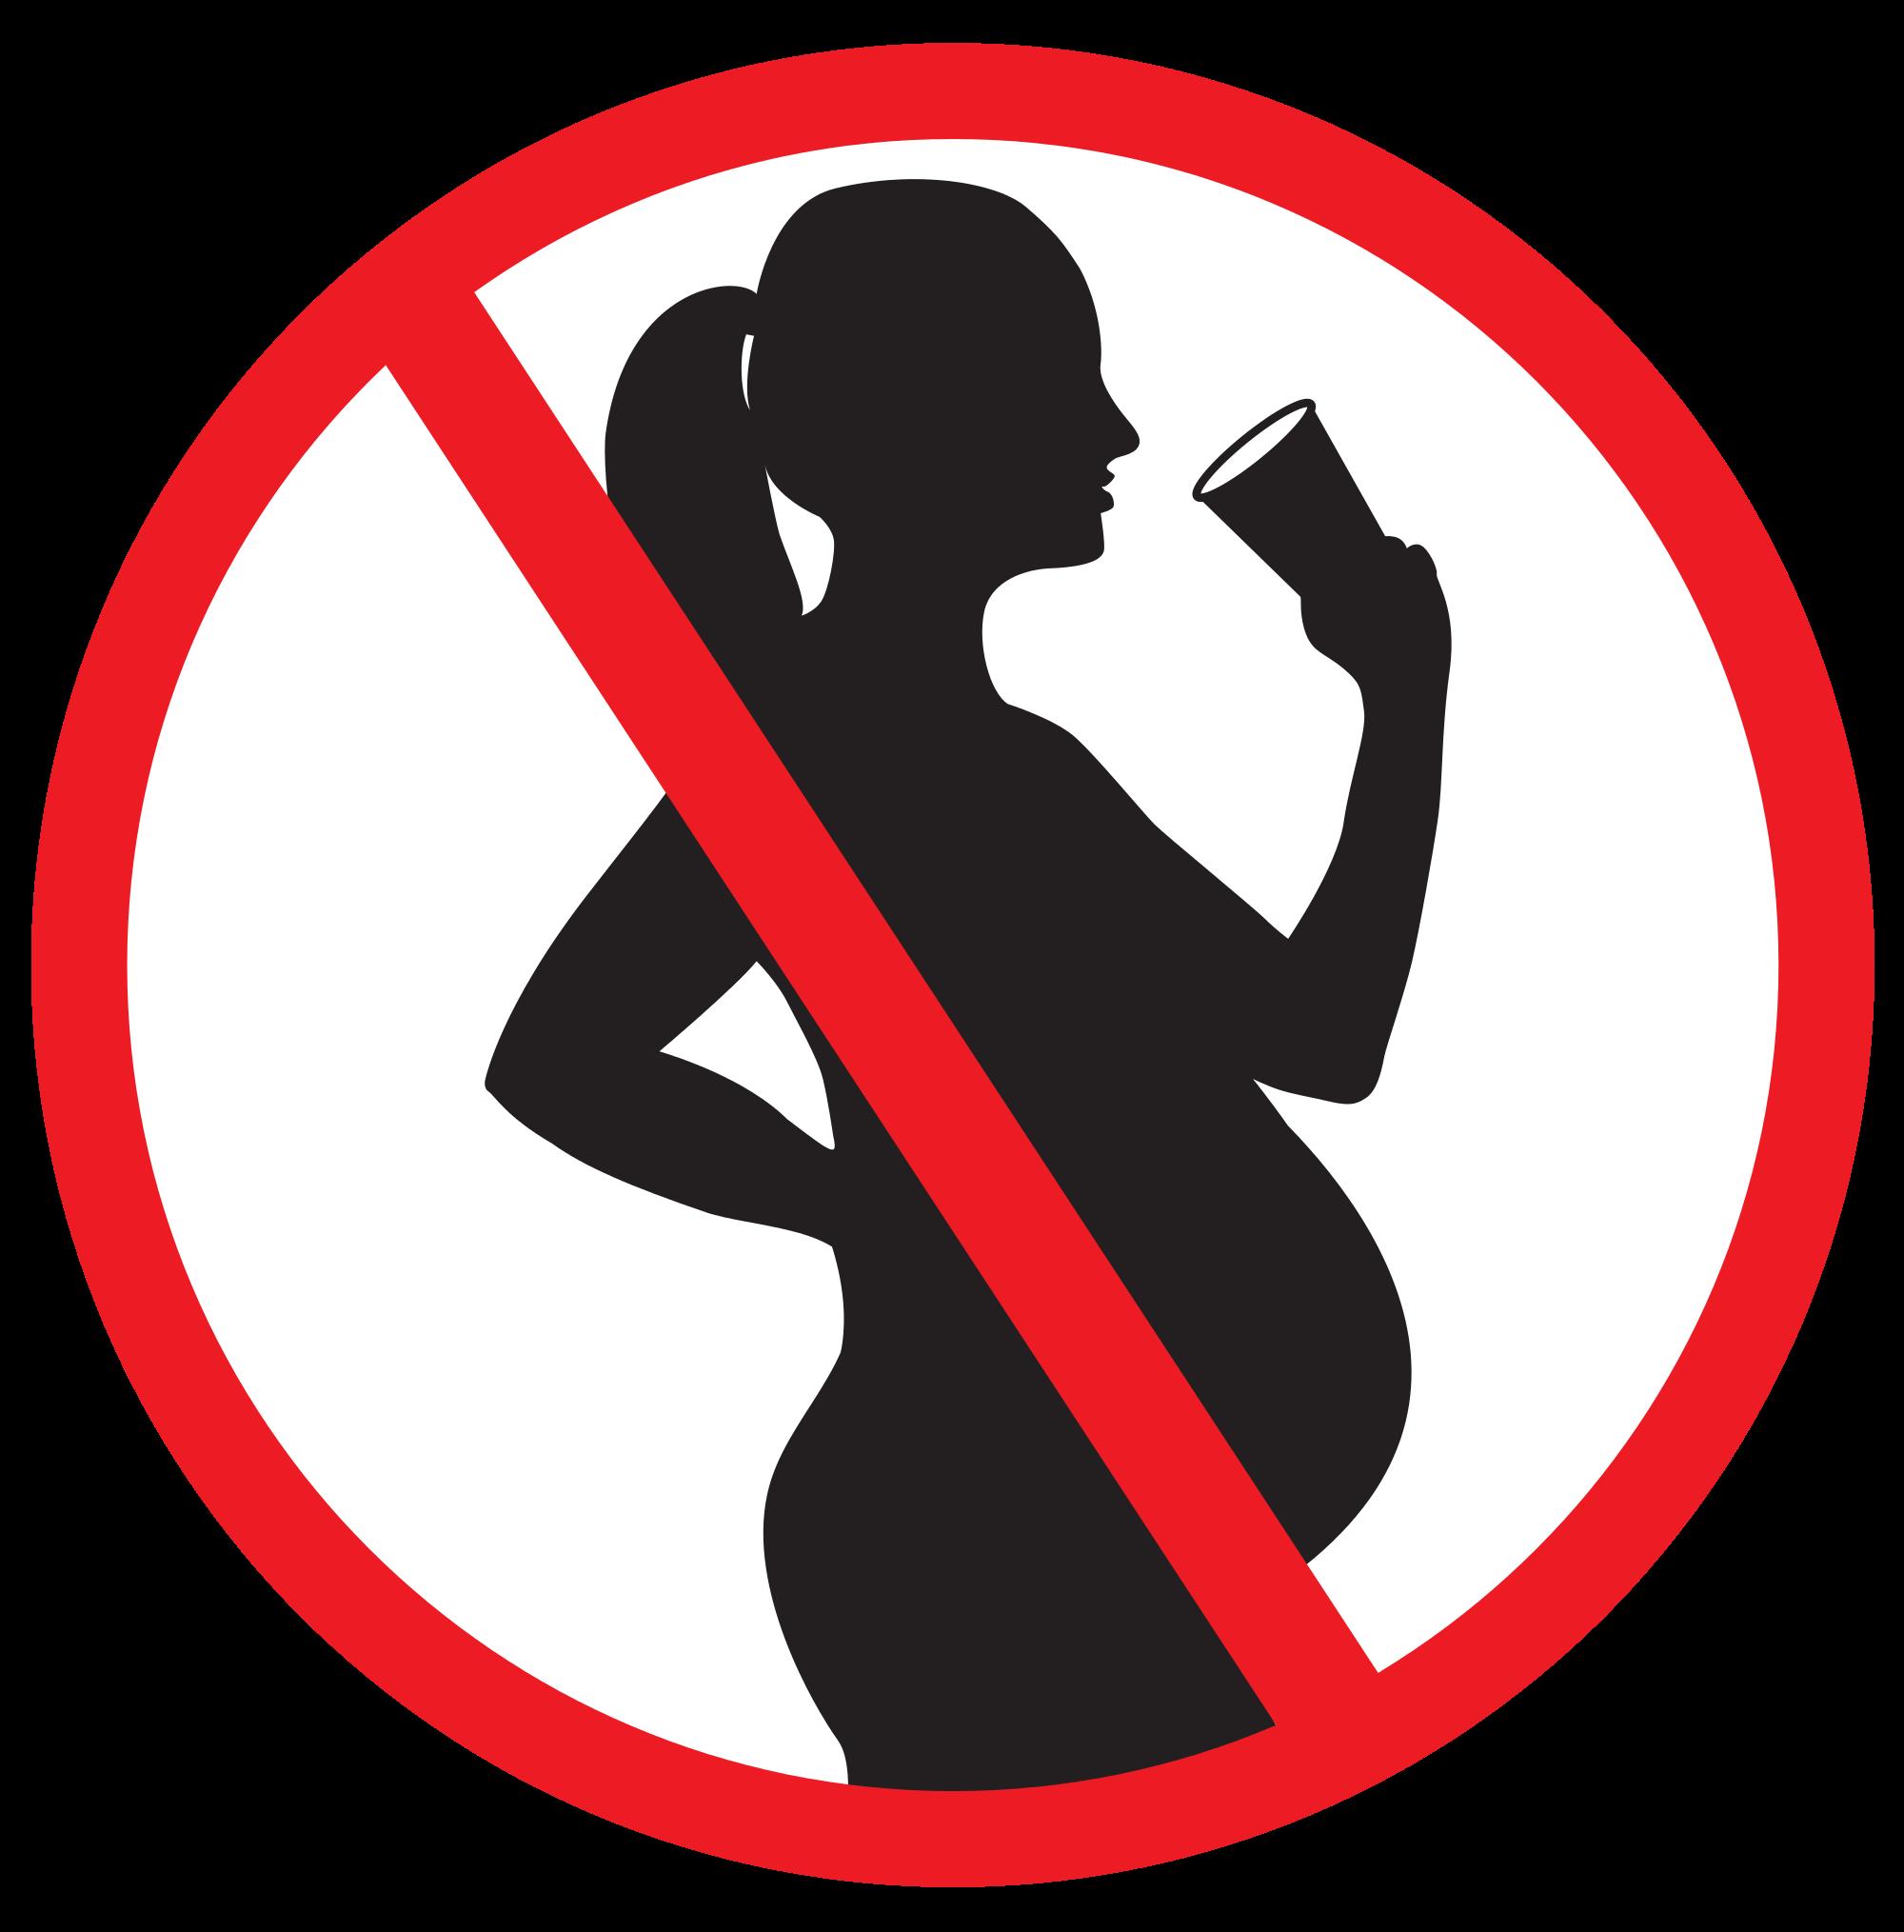 Drinking clipart alcohol awareness. File zero alcool pendant